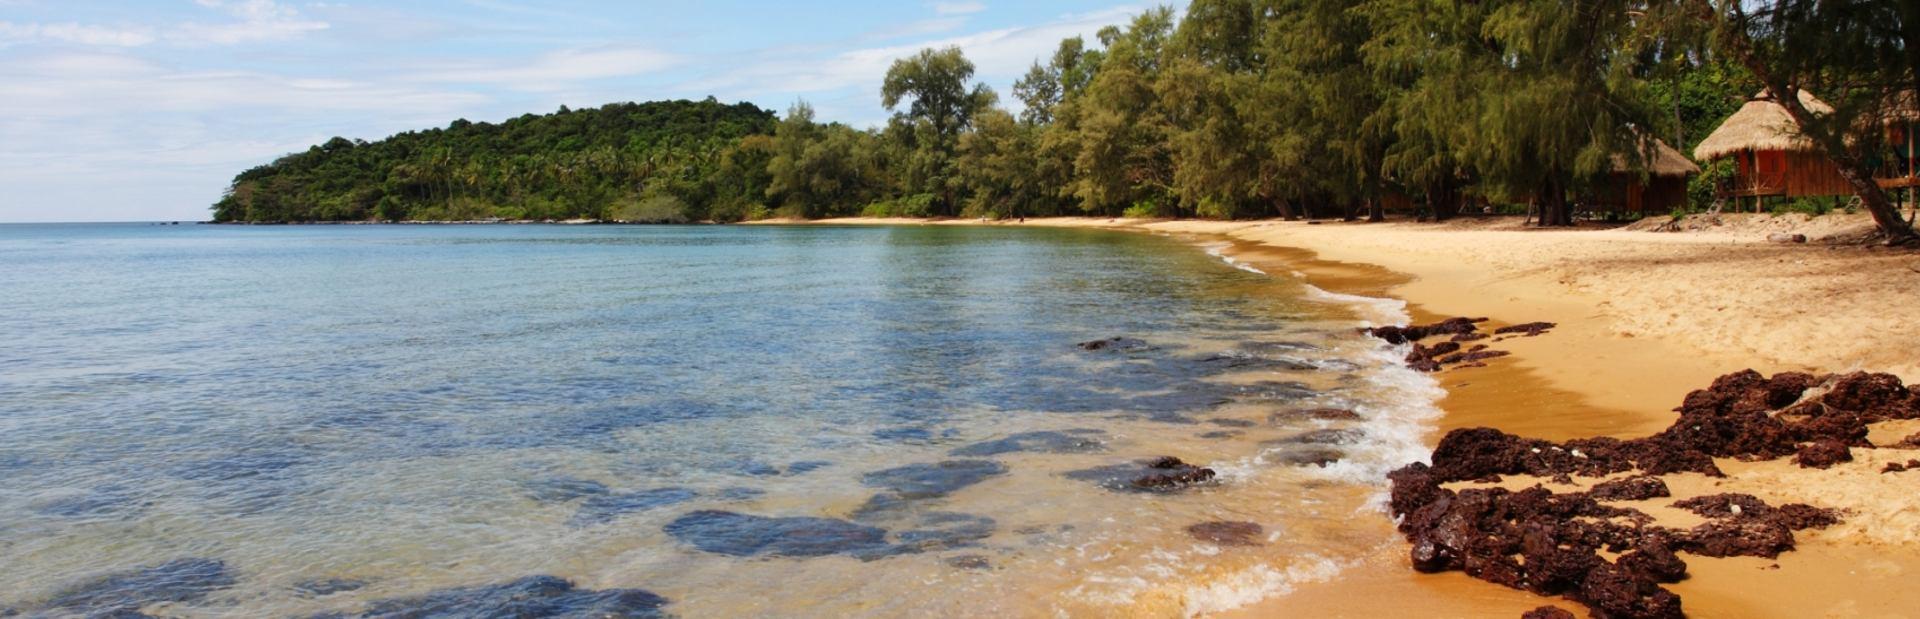 Tranquil, natural beach